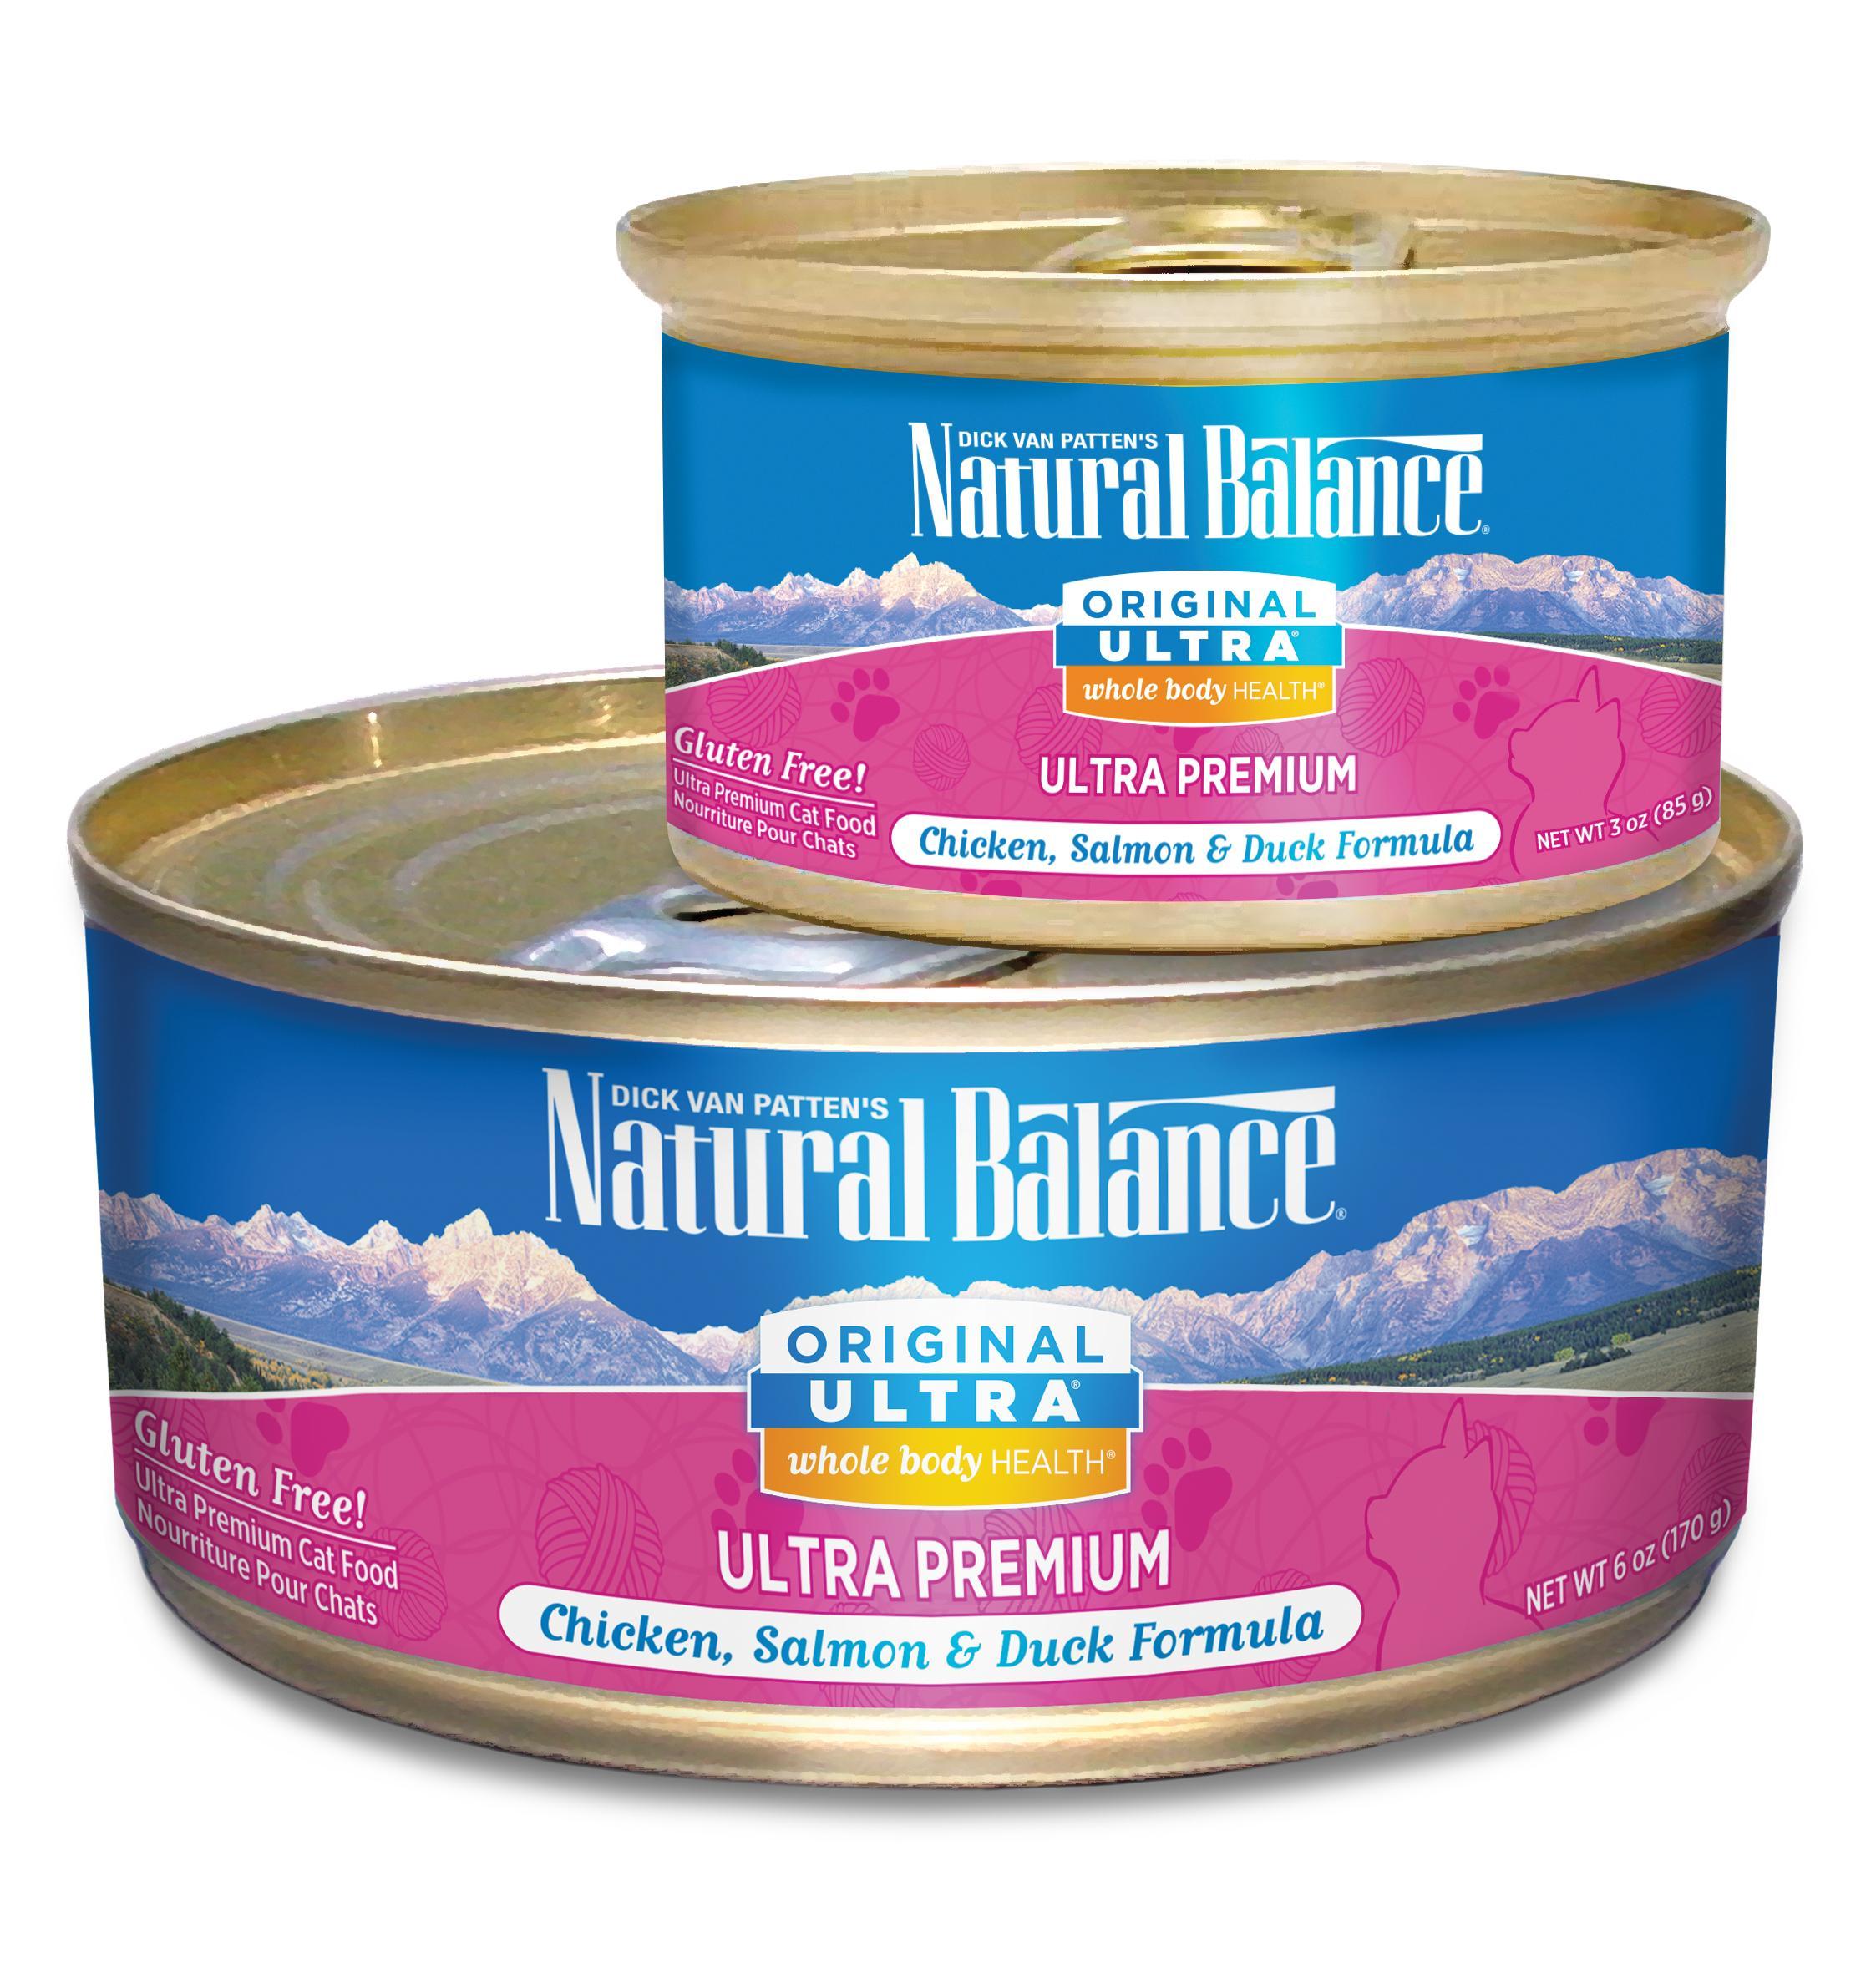 Wellness Cat Food Vs Natural Balance